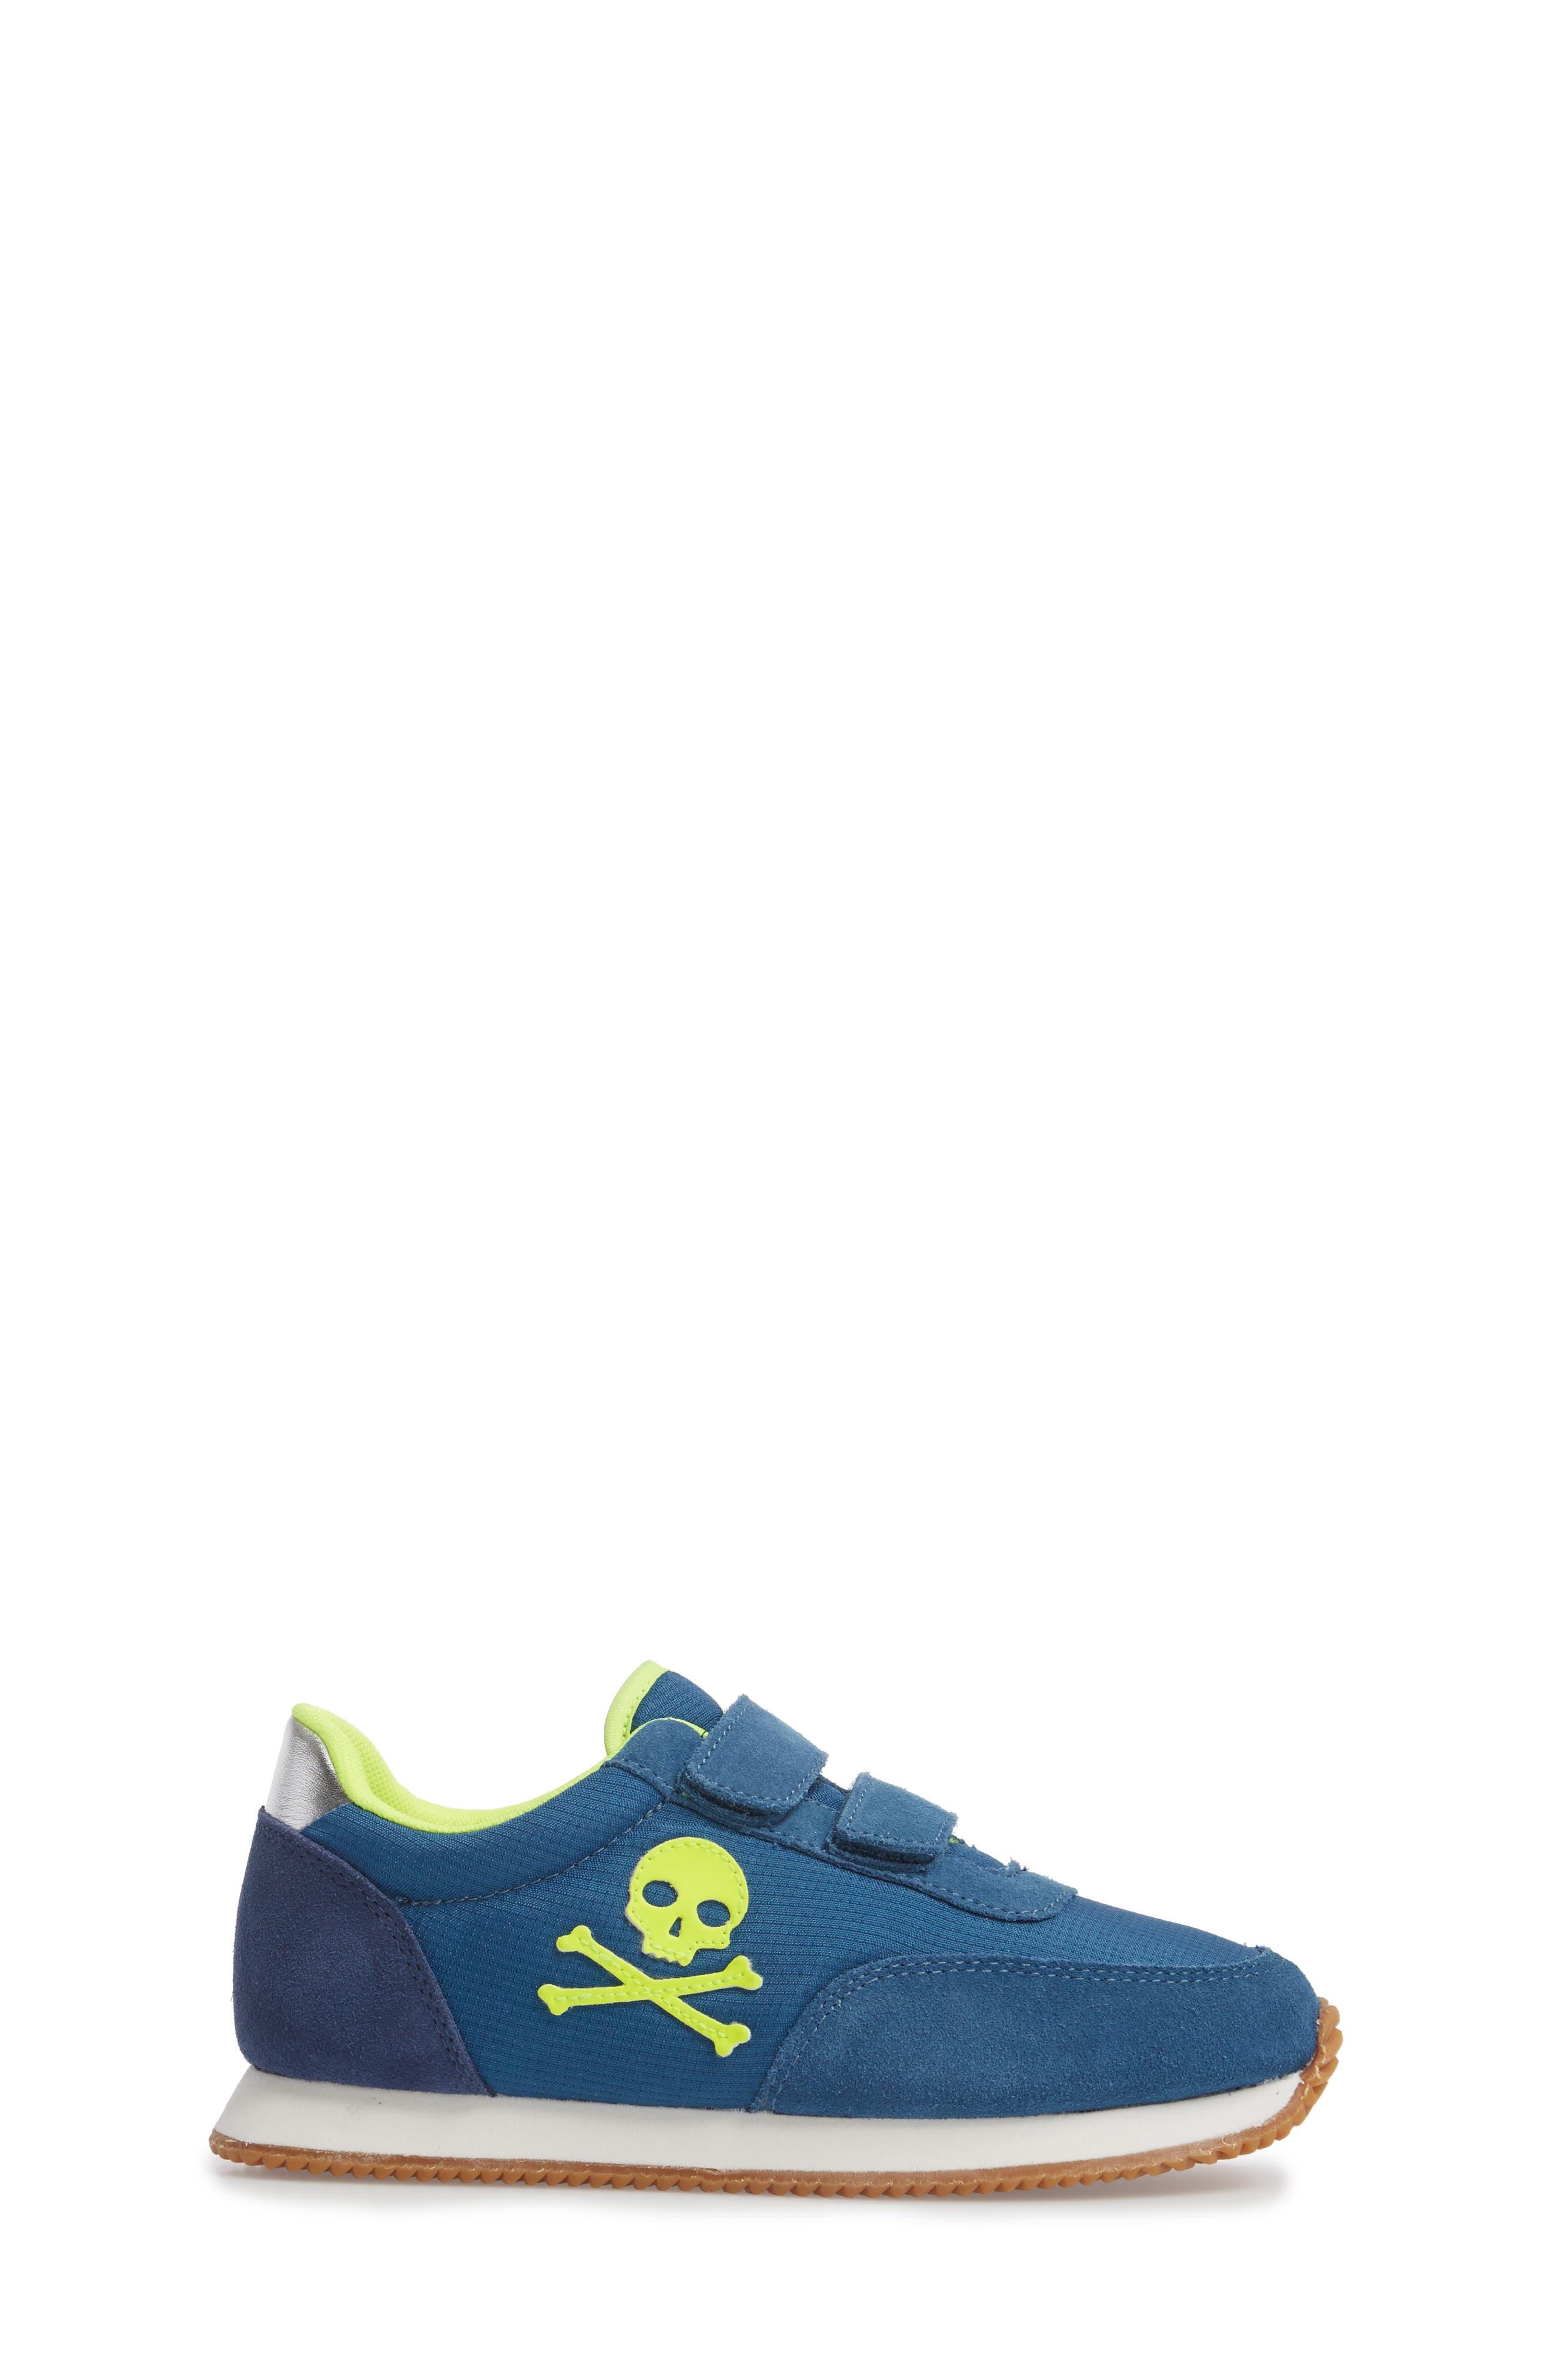 Alternate Image 3  - Mini Boden Print Sneakers (Toddler, Little Kid & Big Kid)